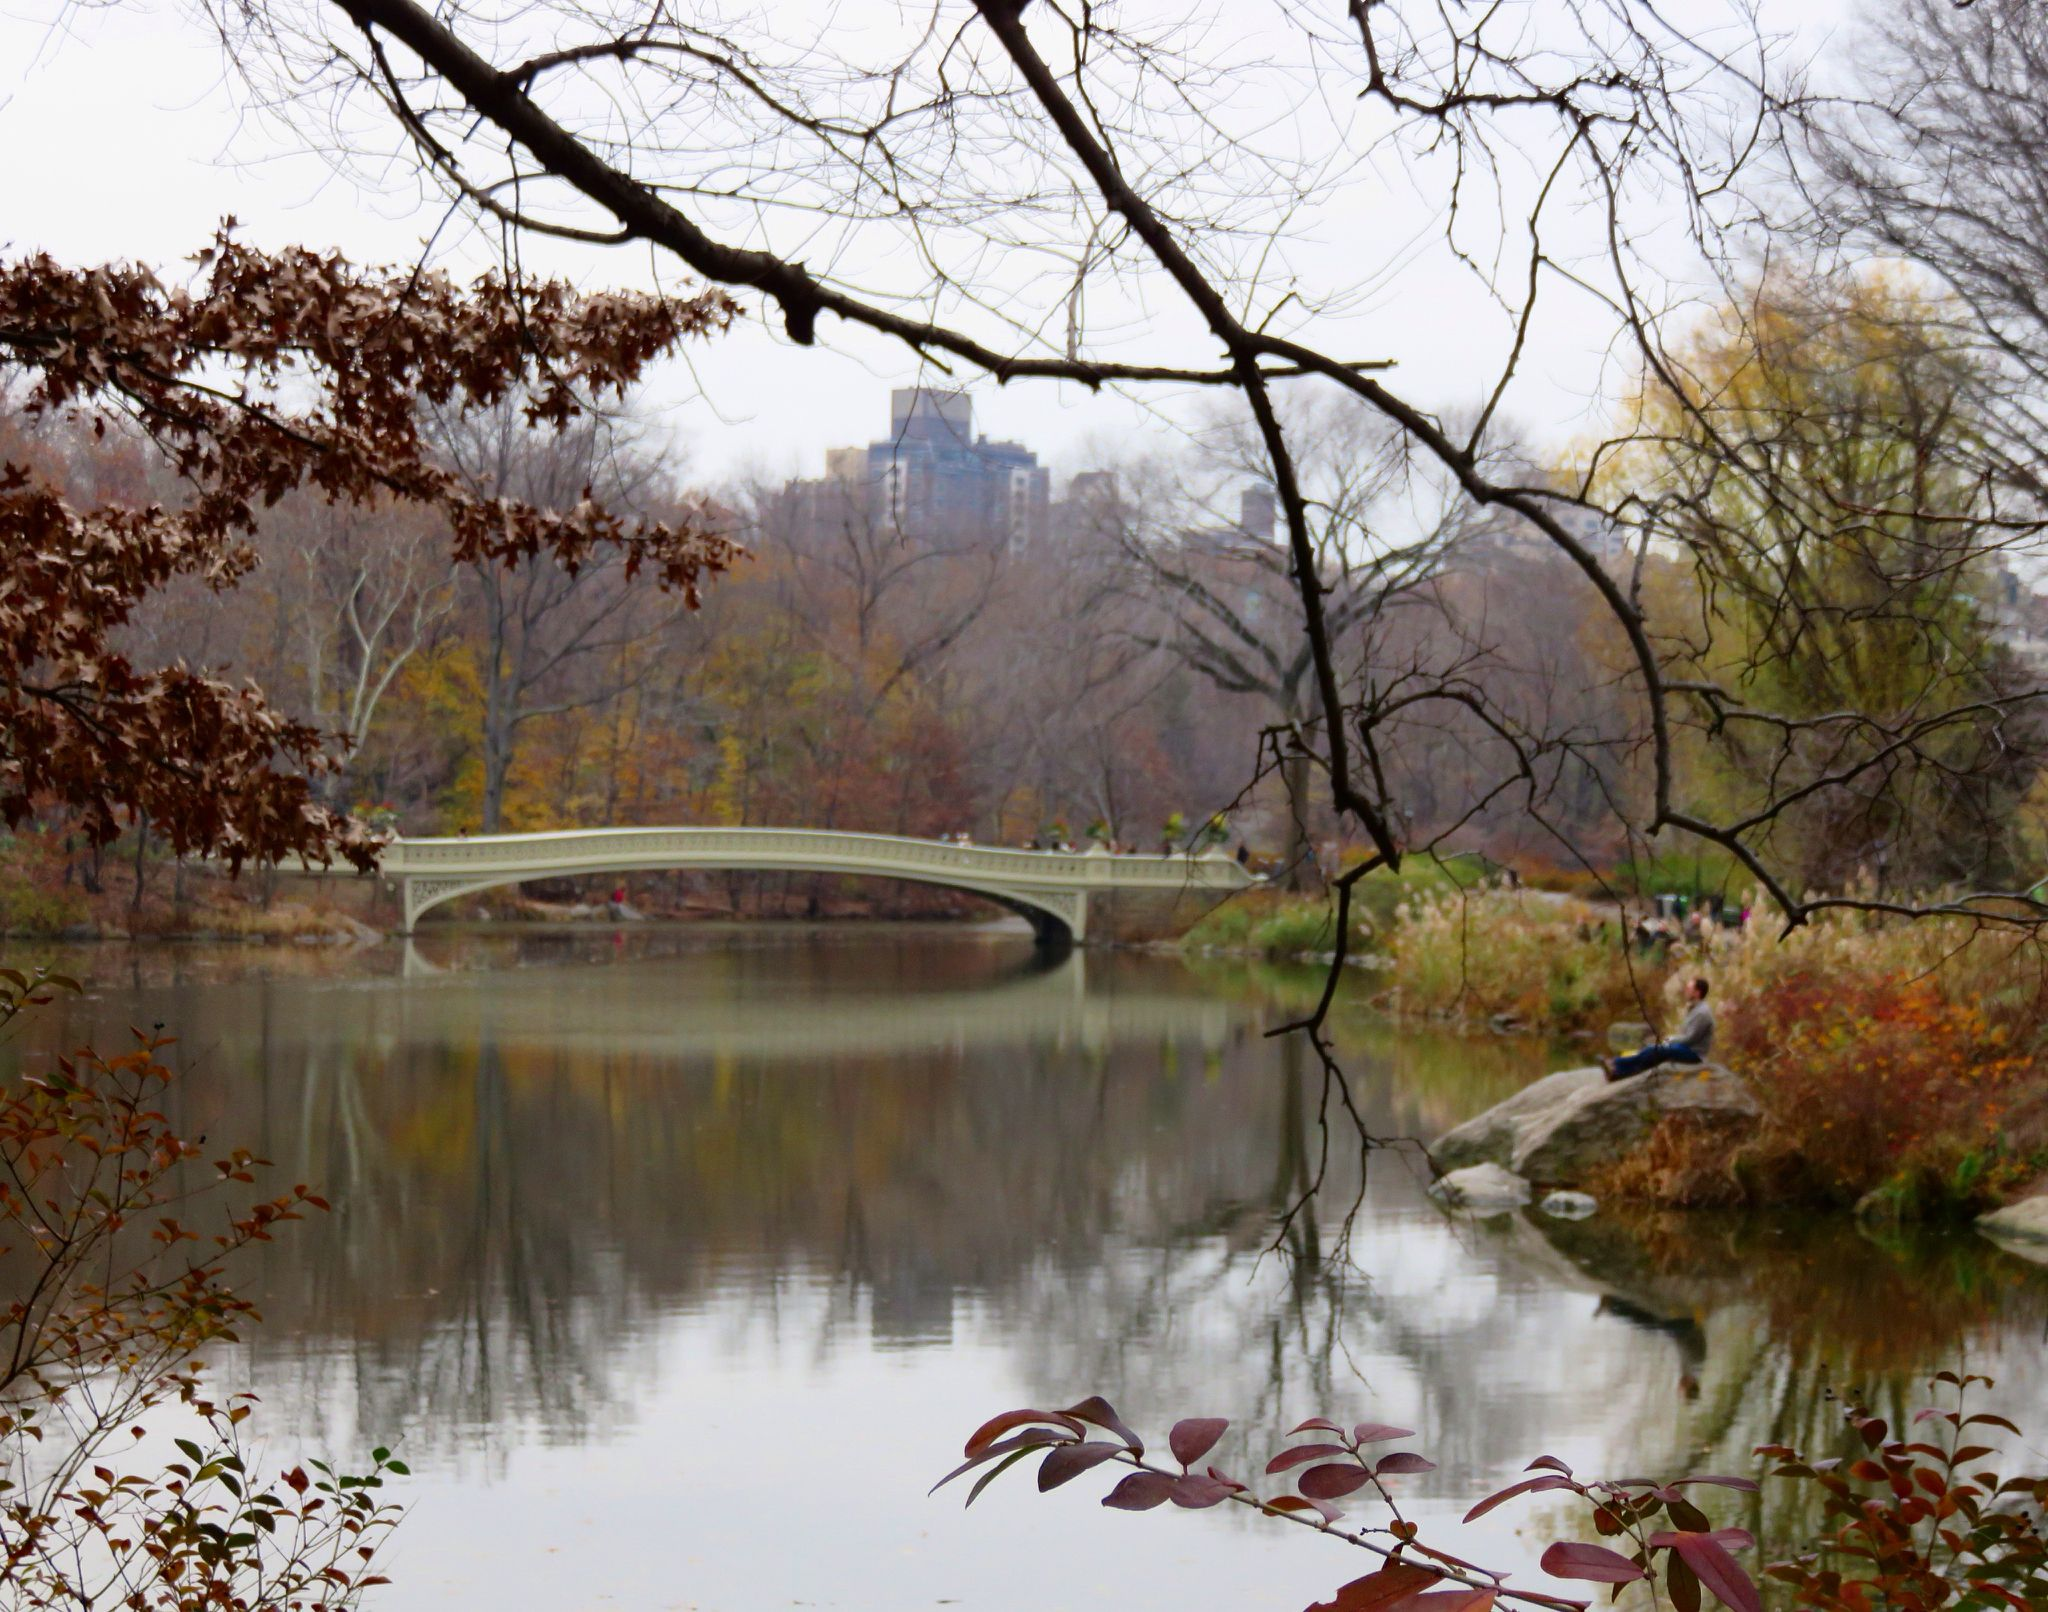 Central Parkin New York